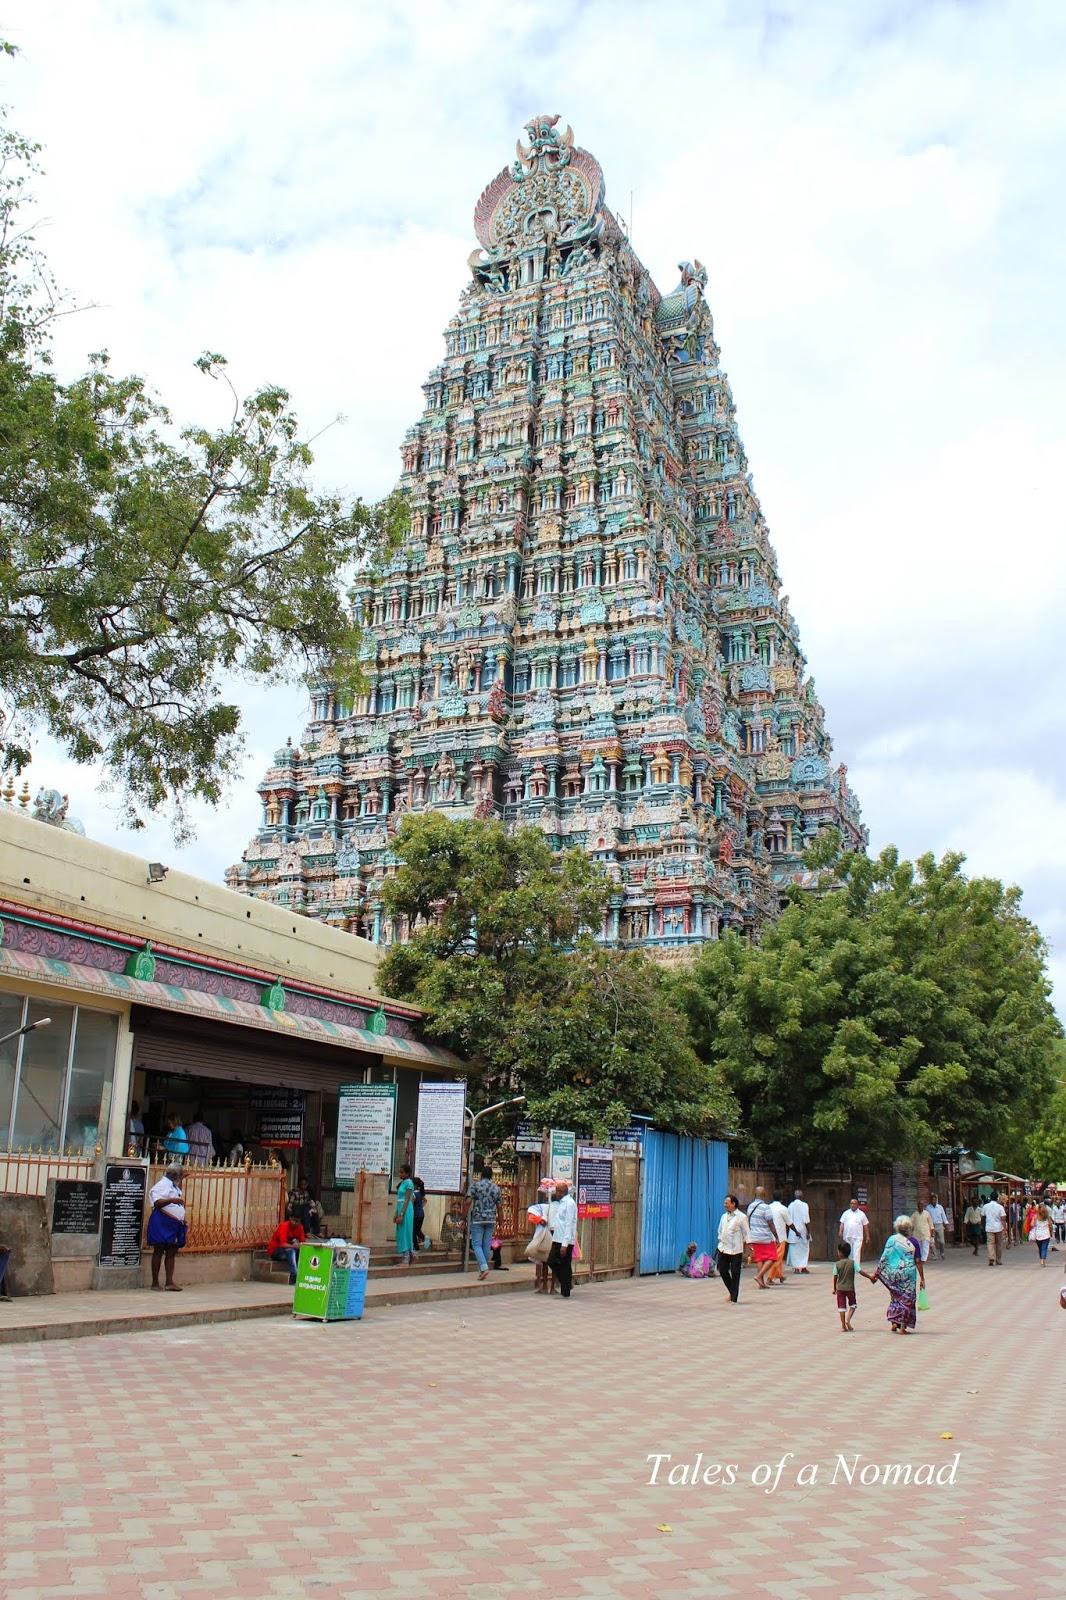 Tales Of A Nomad: Madurai- The Heart of Tamil Nadu